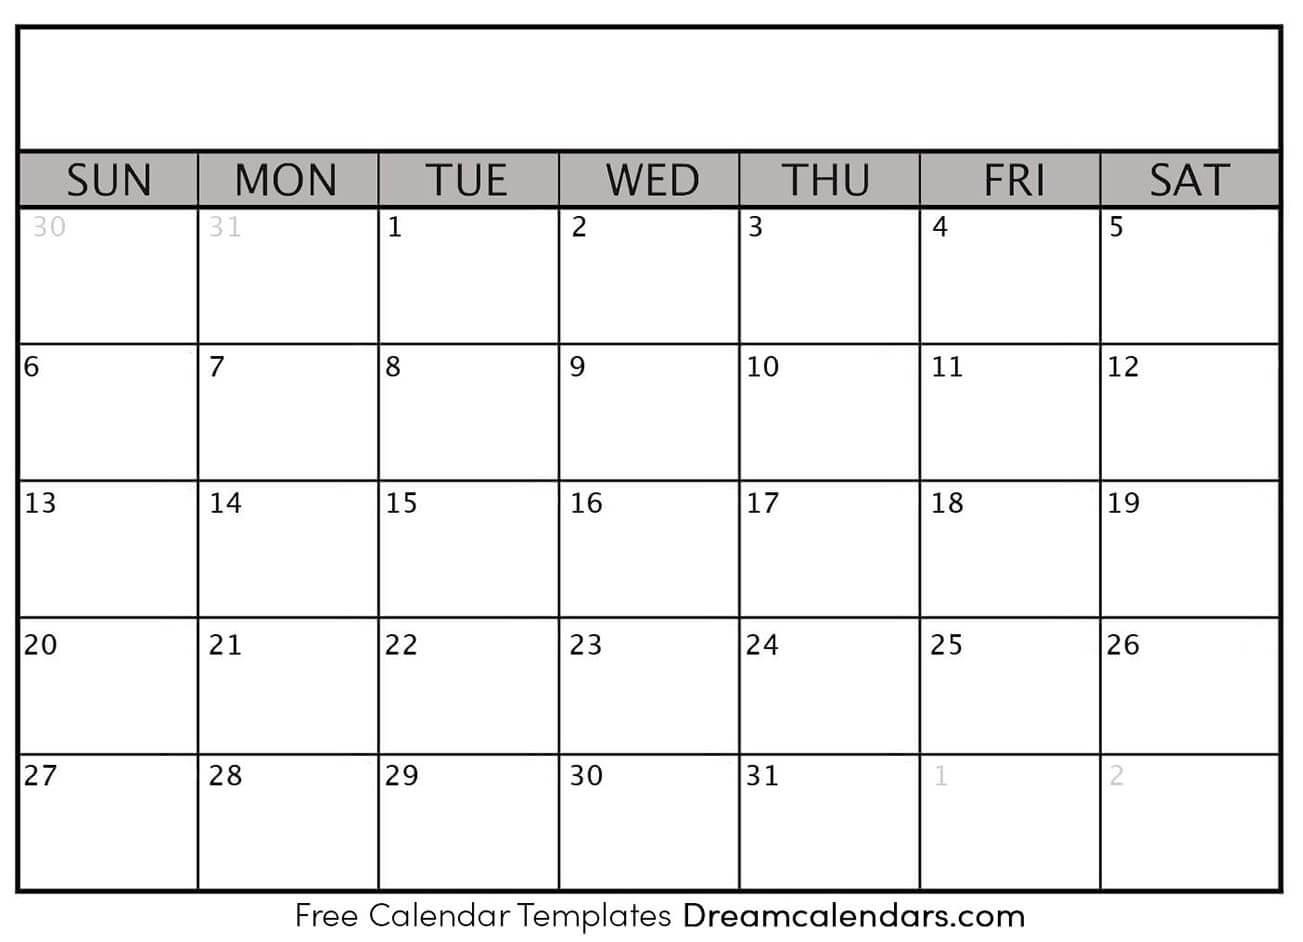 Printable Blank Calendar 2020 | Dream Calendars